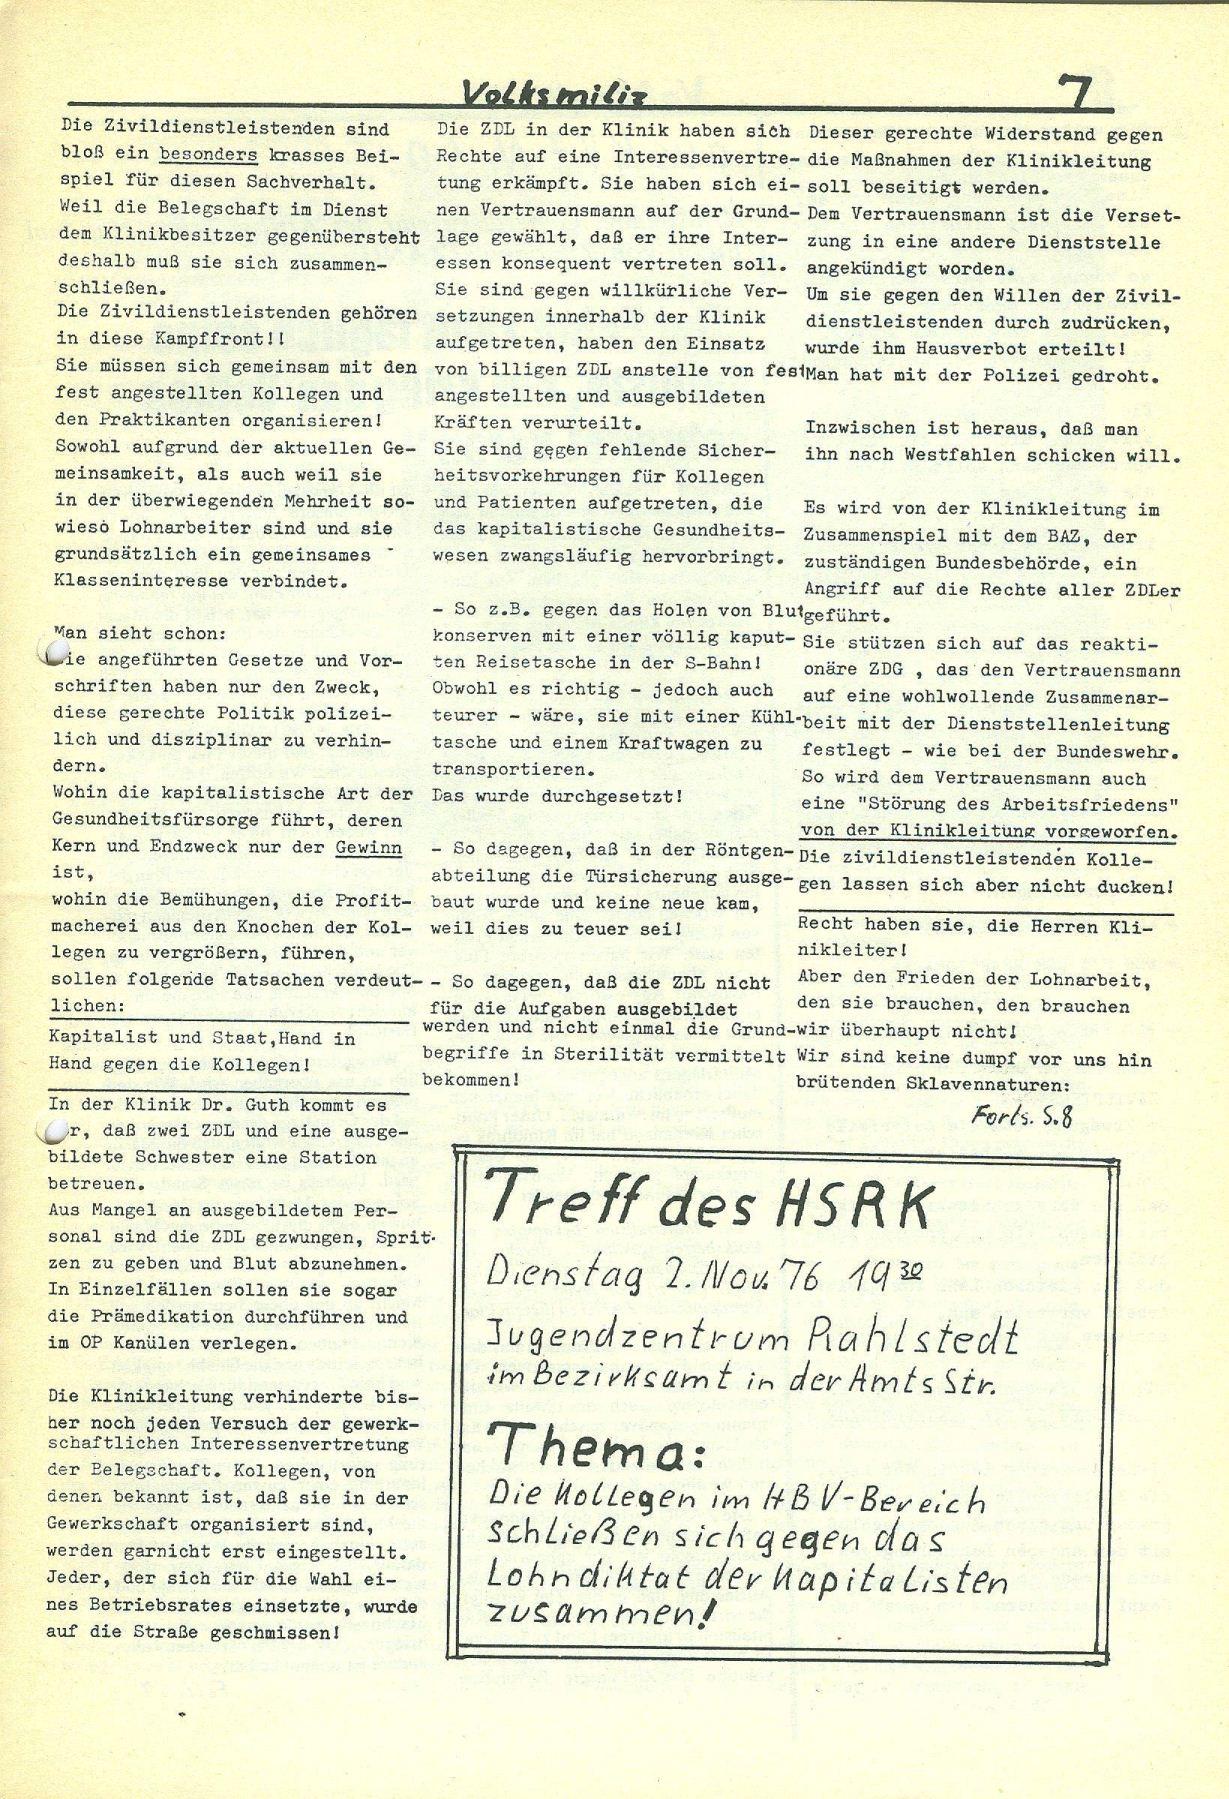 Hamburg_SRK280